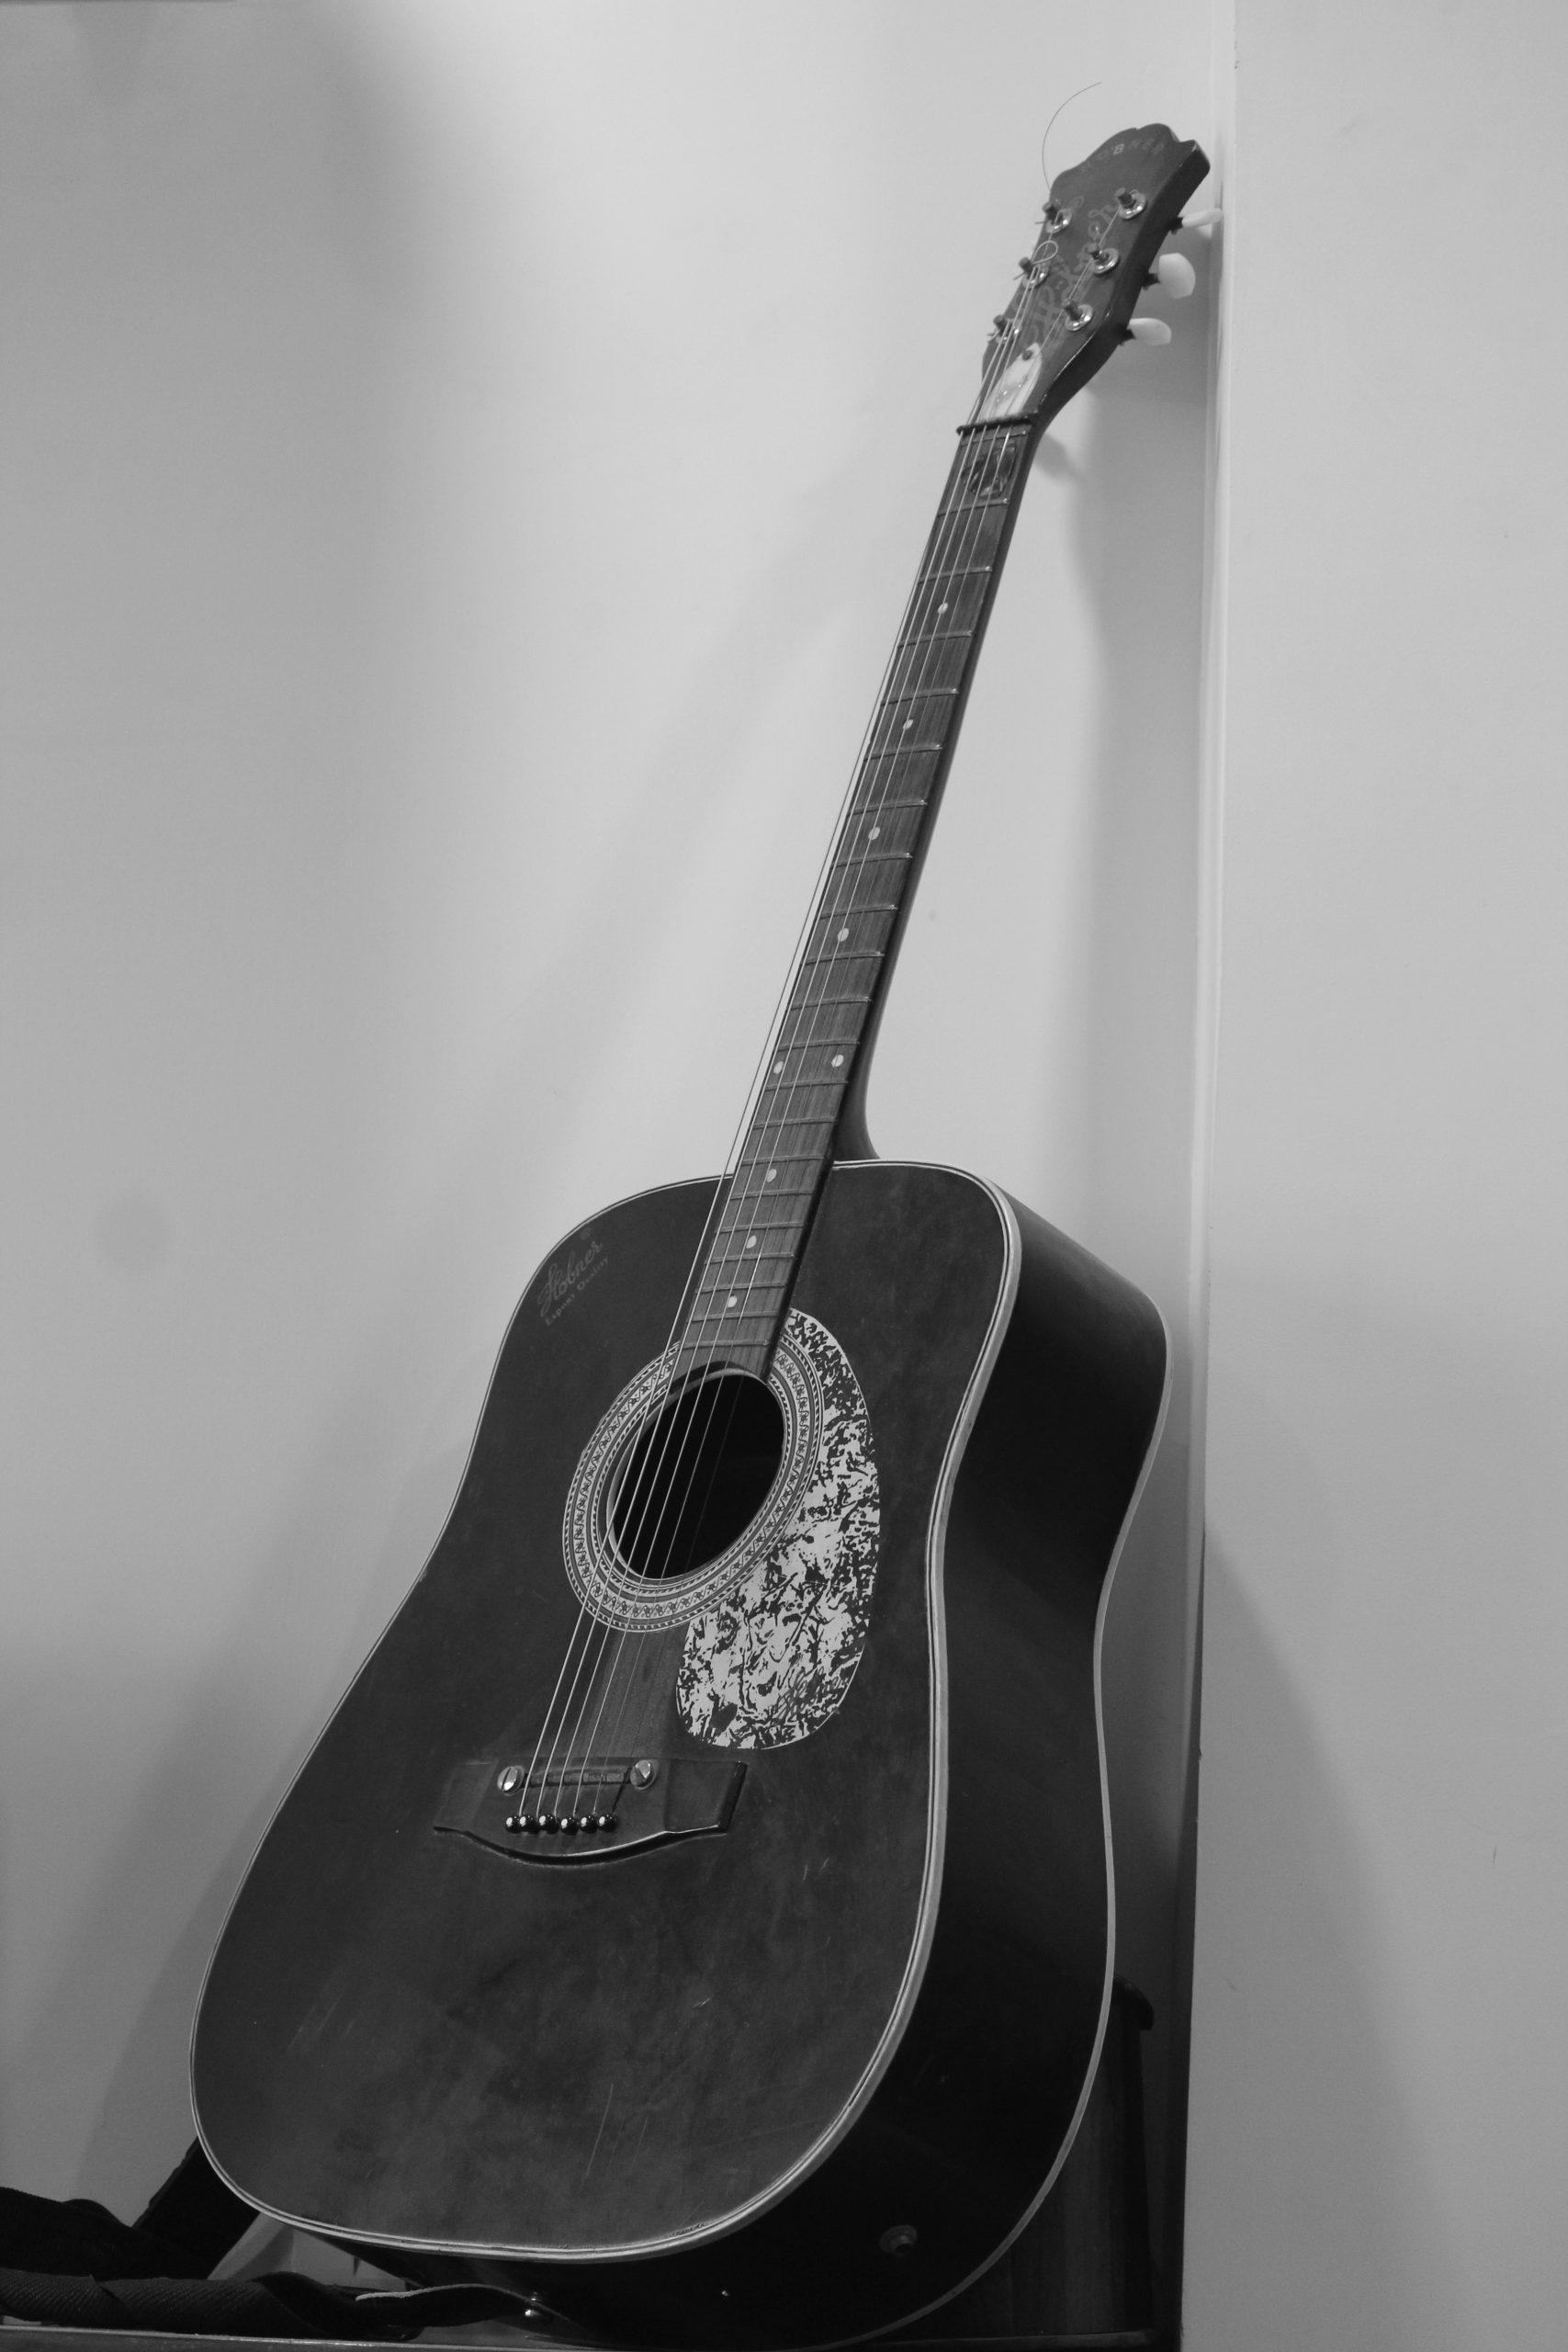 Guitar Monochrome